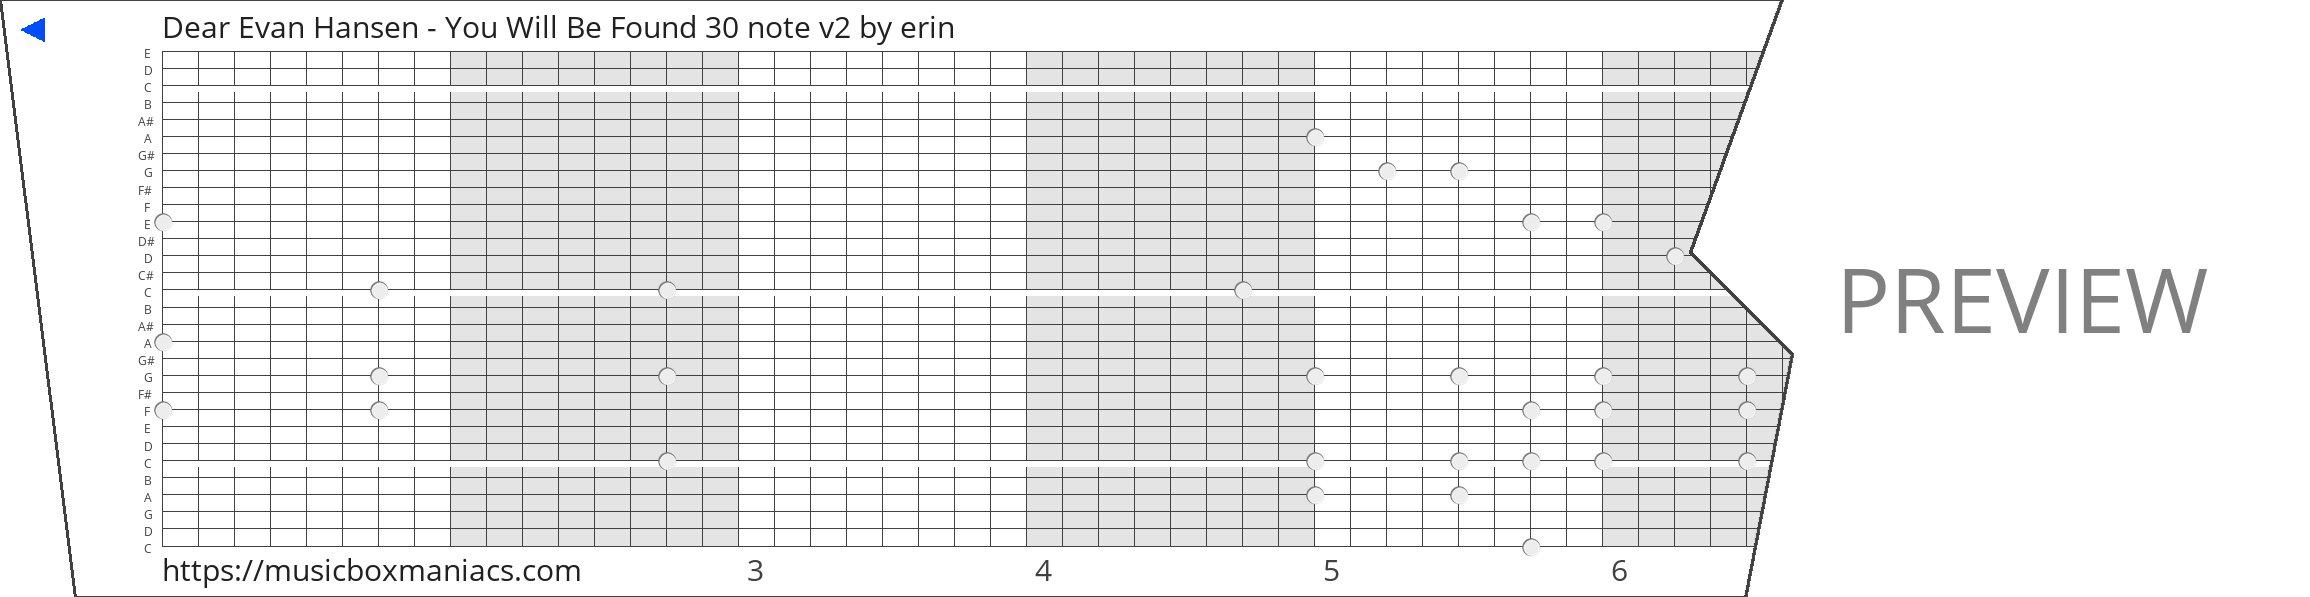 Dear Evan Hansen - You Will Be Found 30 note v2 30 note music box paper strip